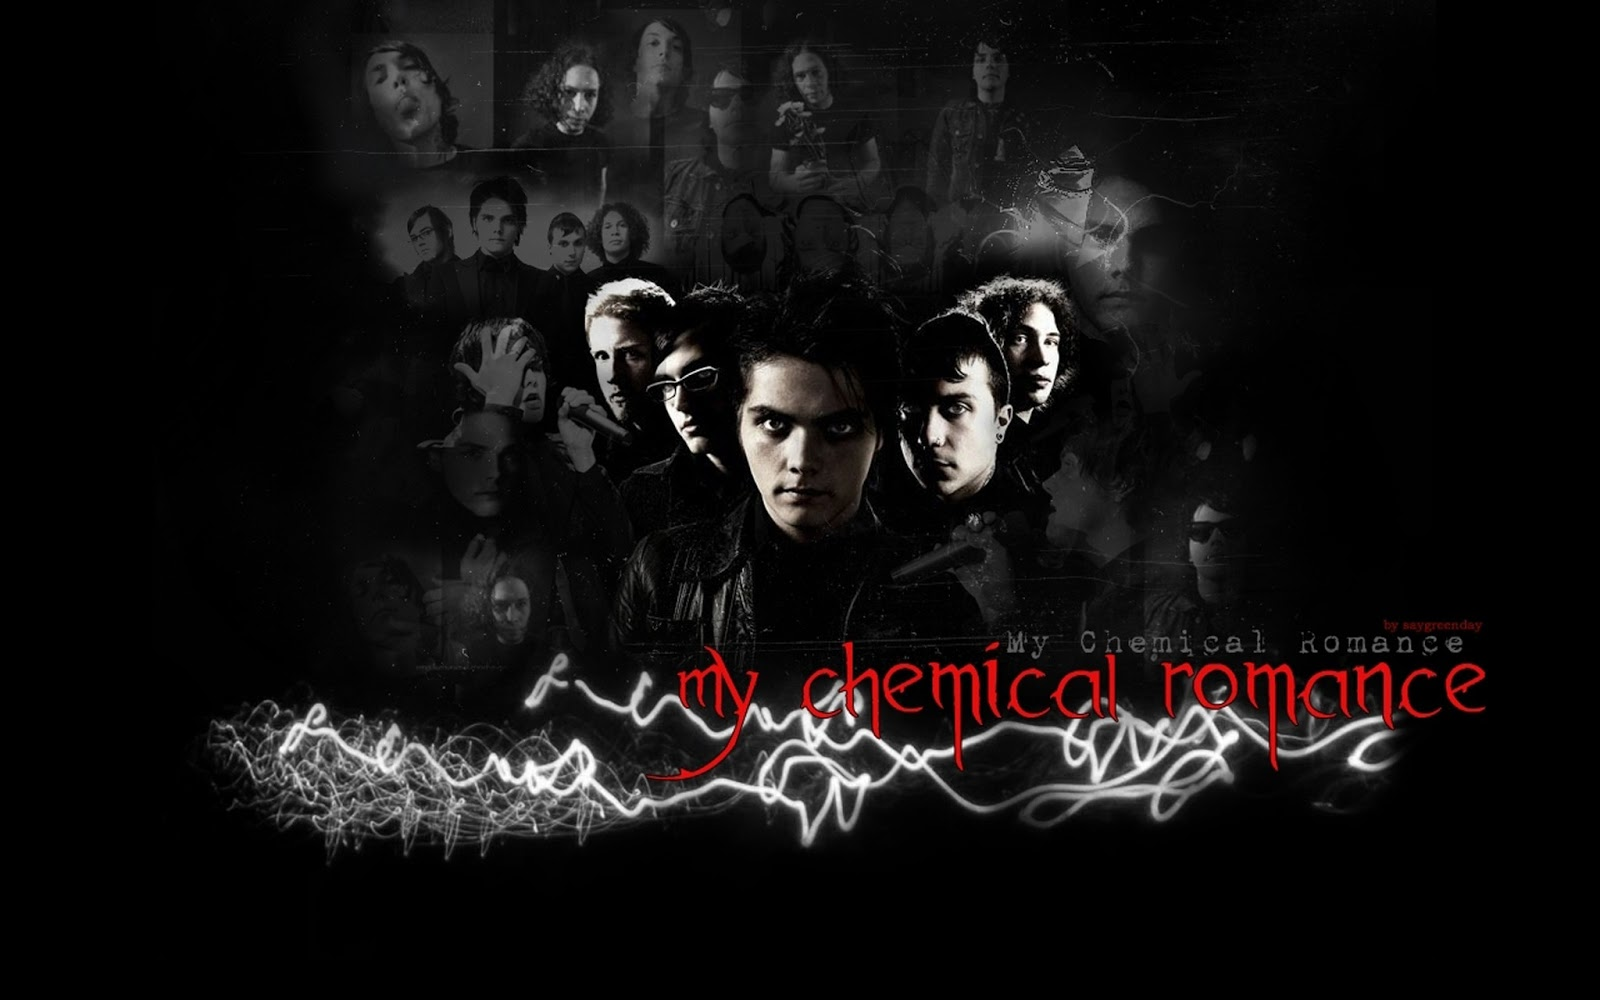 My Chemical Romance Wallpaper Perfect Wallpaper 1600x1000